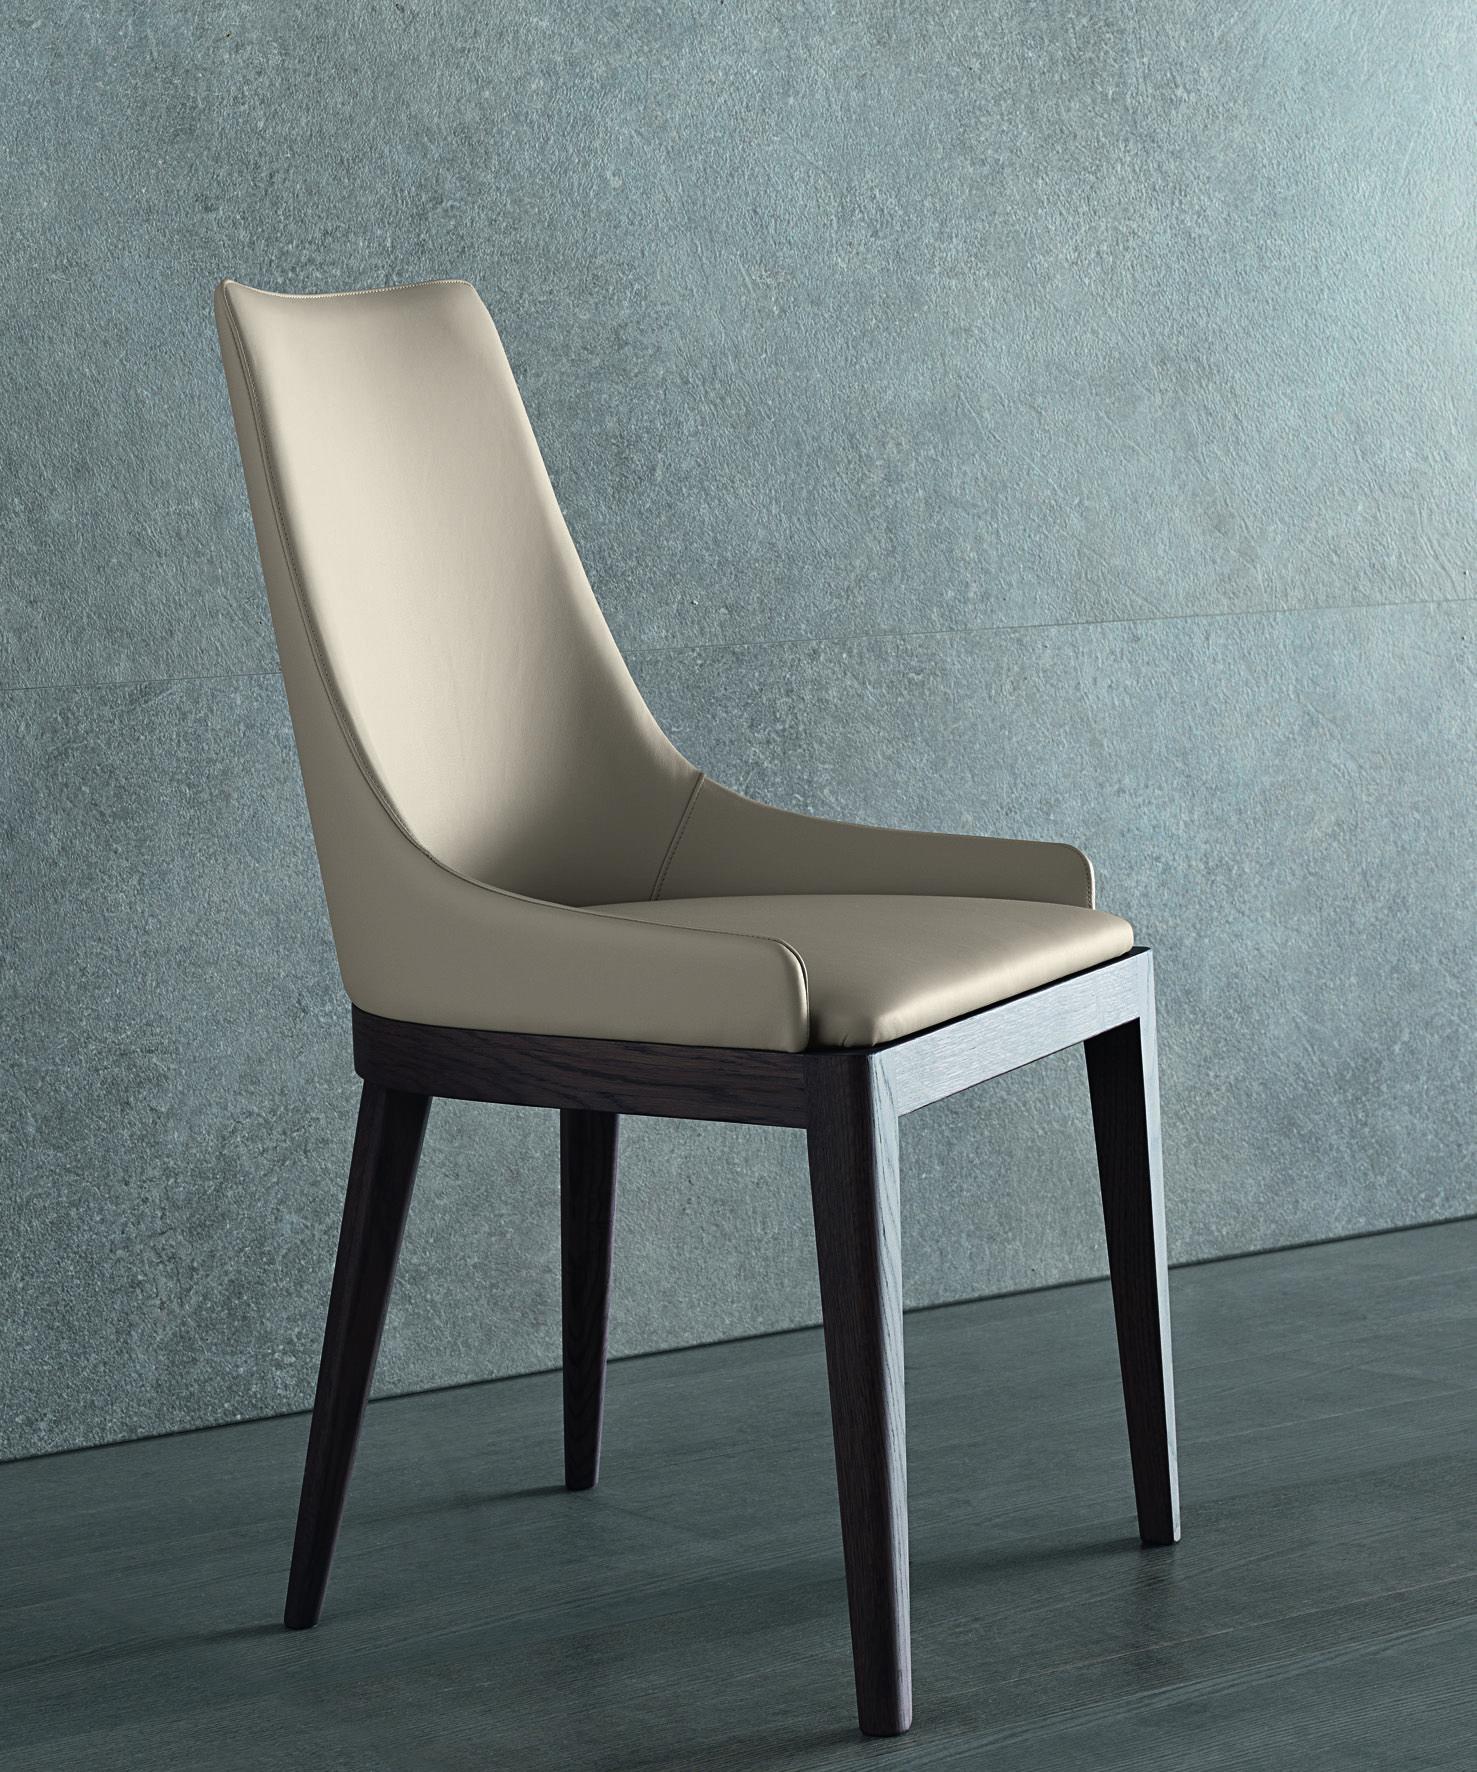 misuraemme furniture. CLEÒ | 椅子 By MisuraEmme Misuraemme Furniture